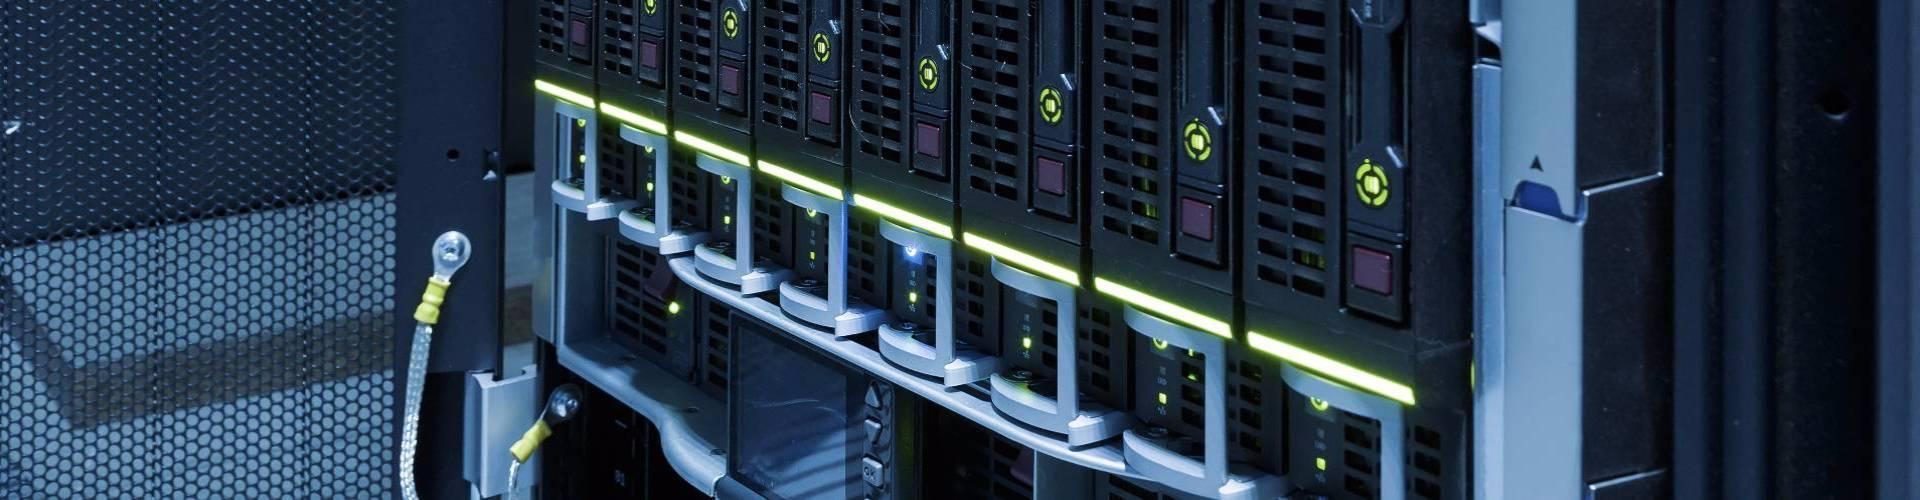 Tips for Securing SSL Renegotiation